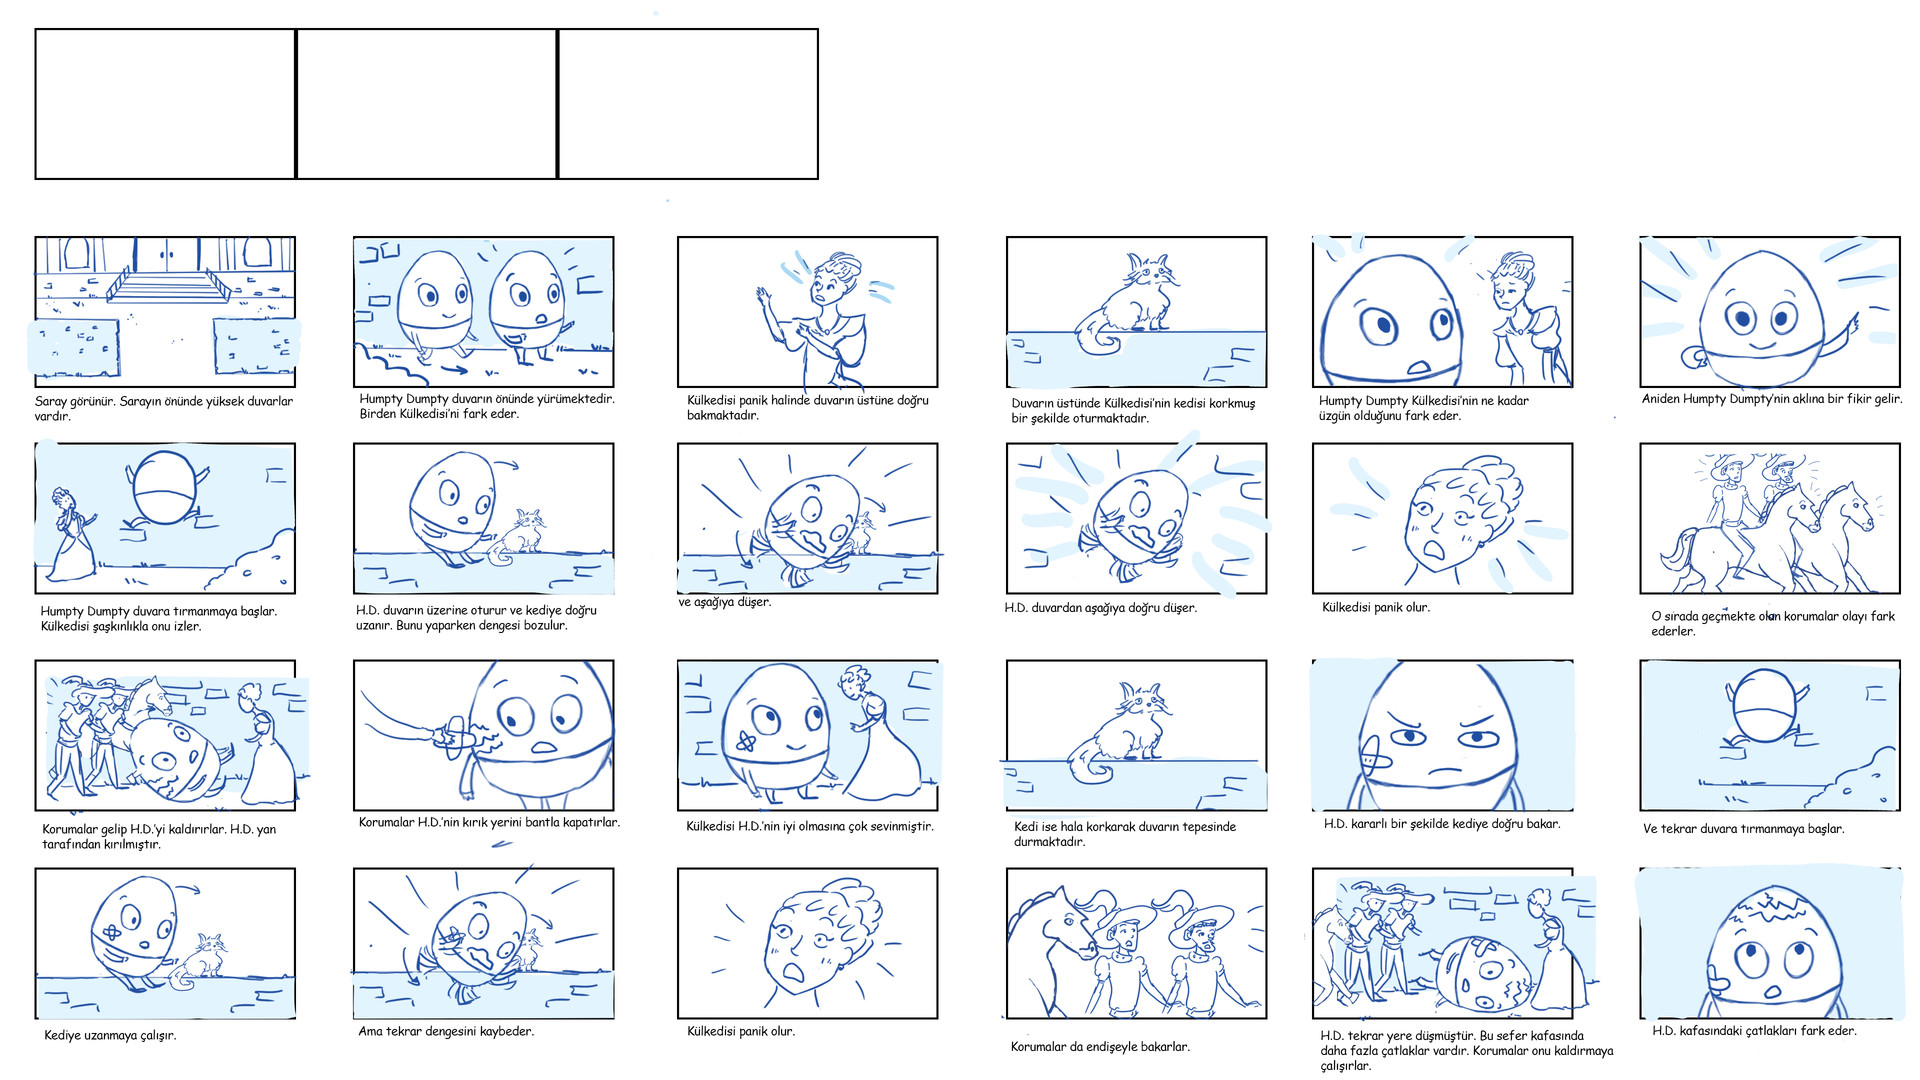 ArtStation - Cindrella and Humpty Dumpty Nursery Rhyme